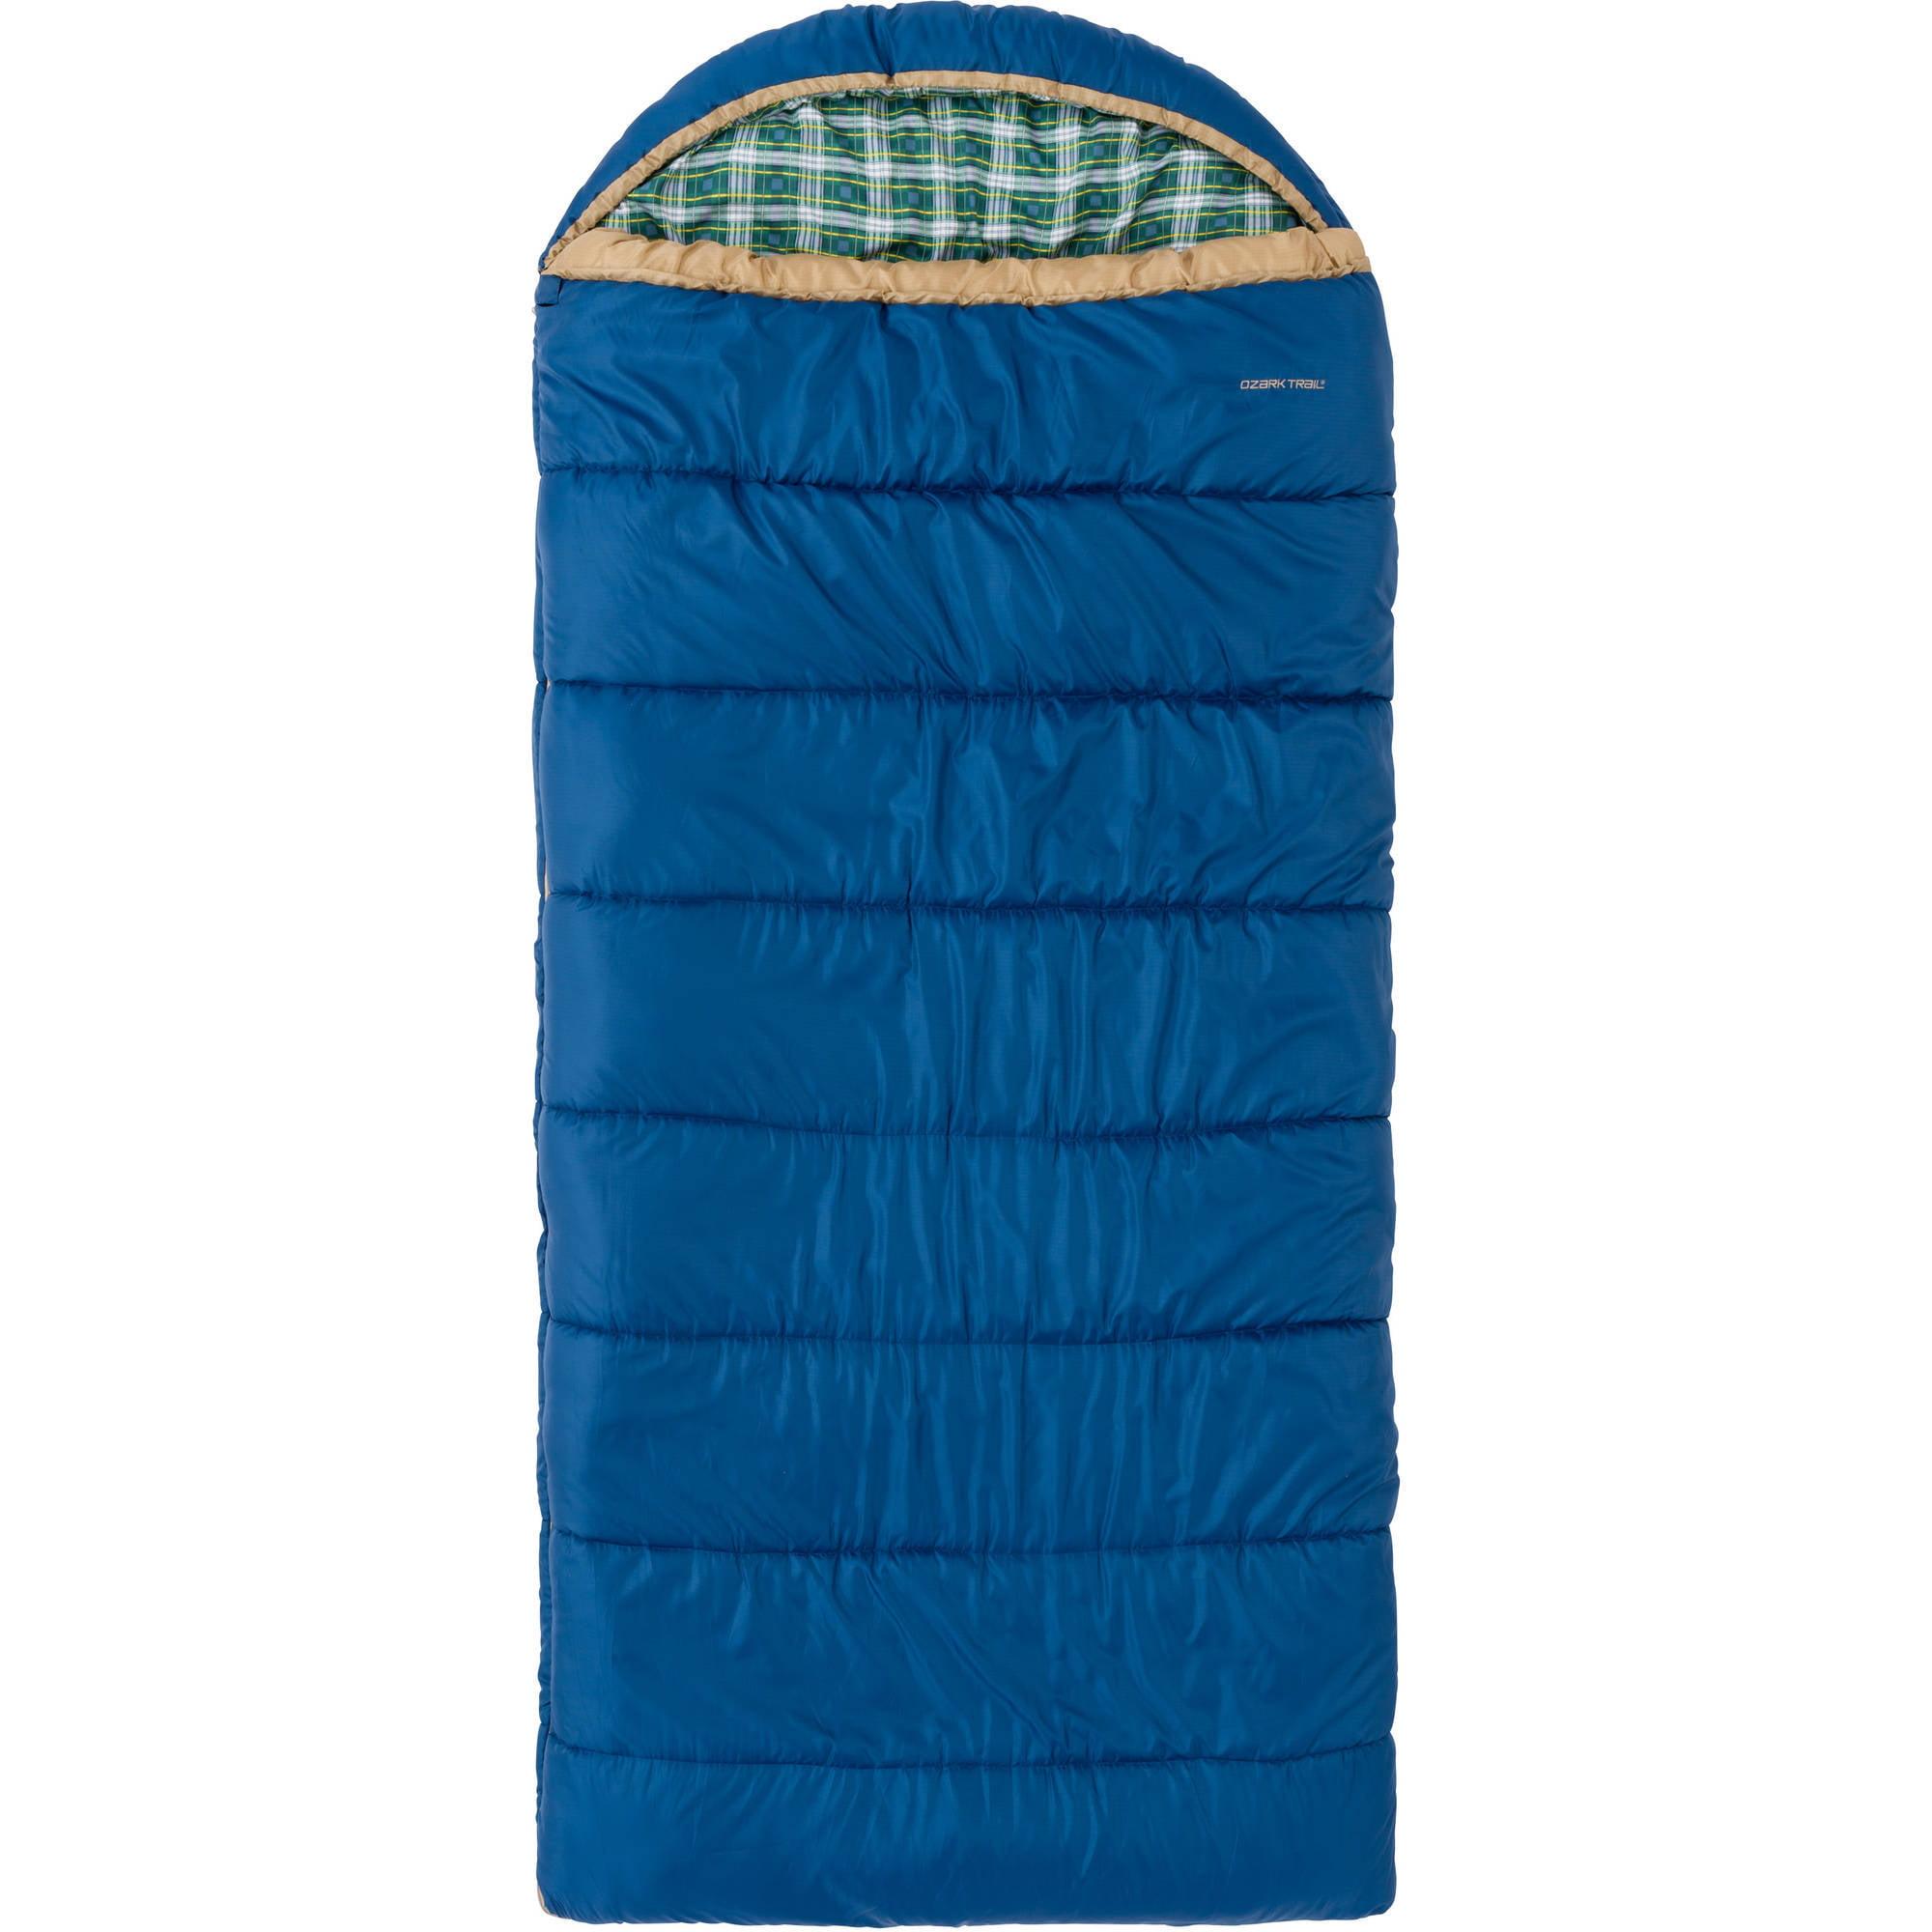 Ozark Trail ENV Zero Extra-Large Sleeping Bag, Blue